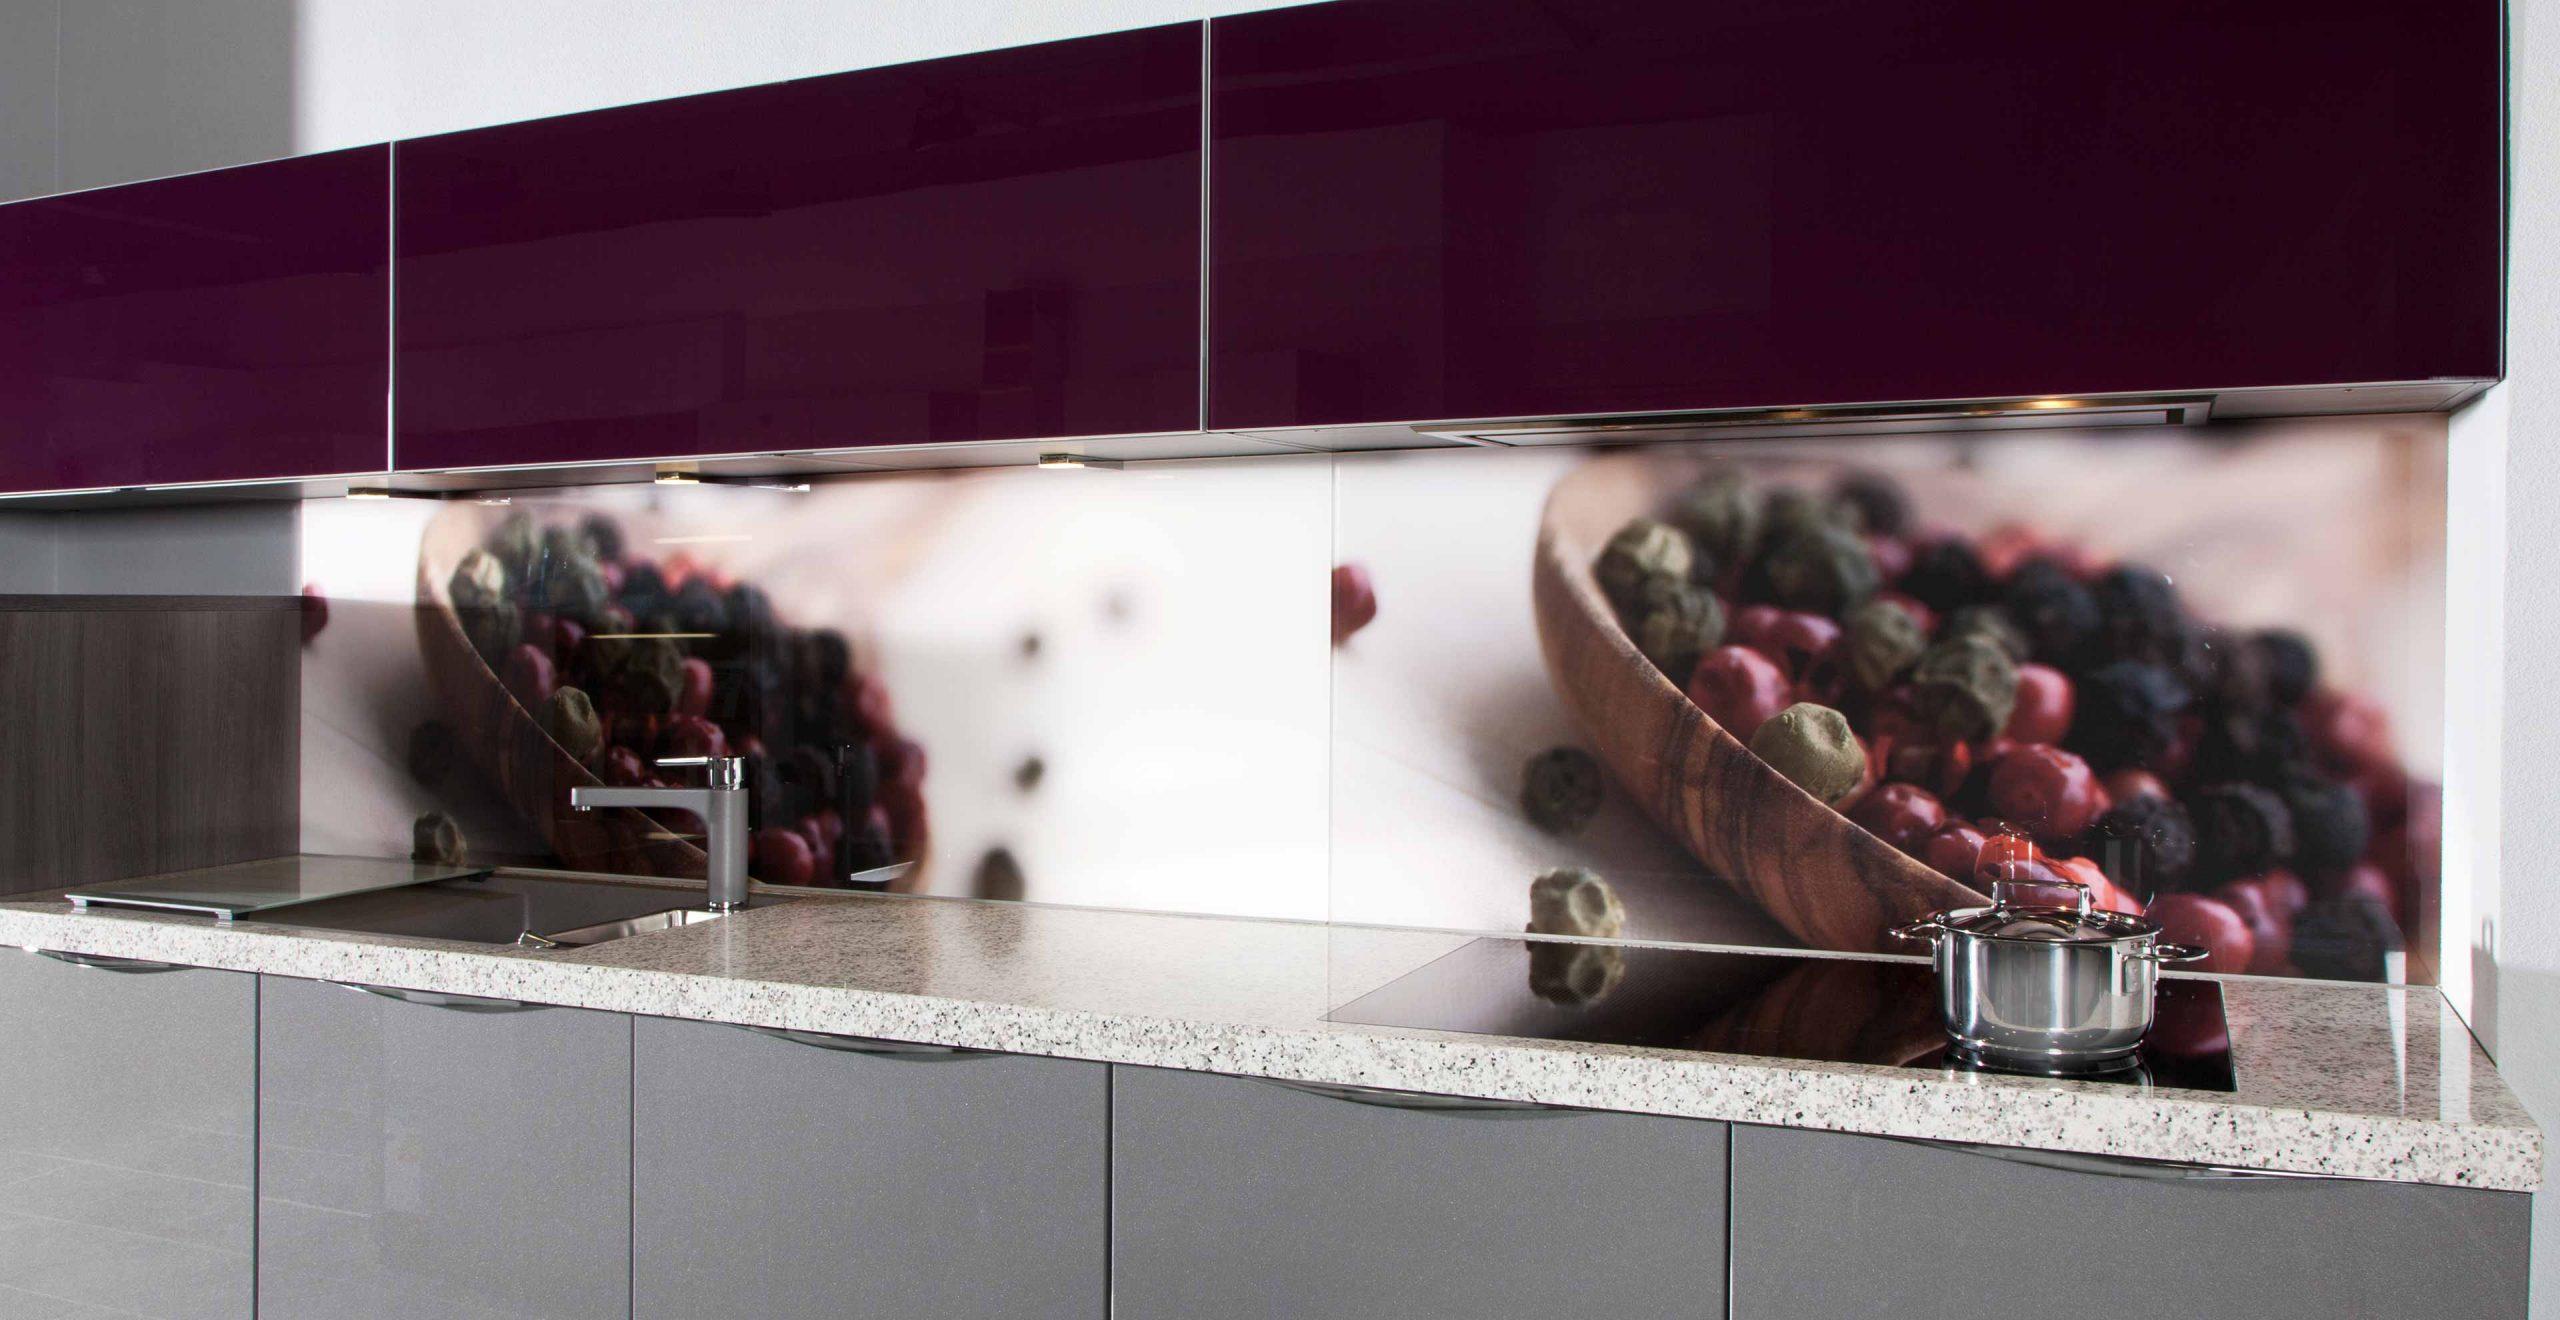 Full Size of Küchenrückwand Entfernen Rückwand Küche Fliesenoptik Rückwand Küche Magnolia Nischenrückwand Küche Glas Küche Nischenrückwand Küche